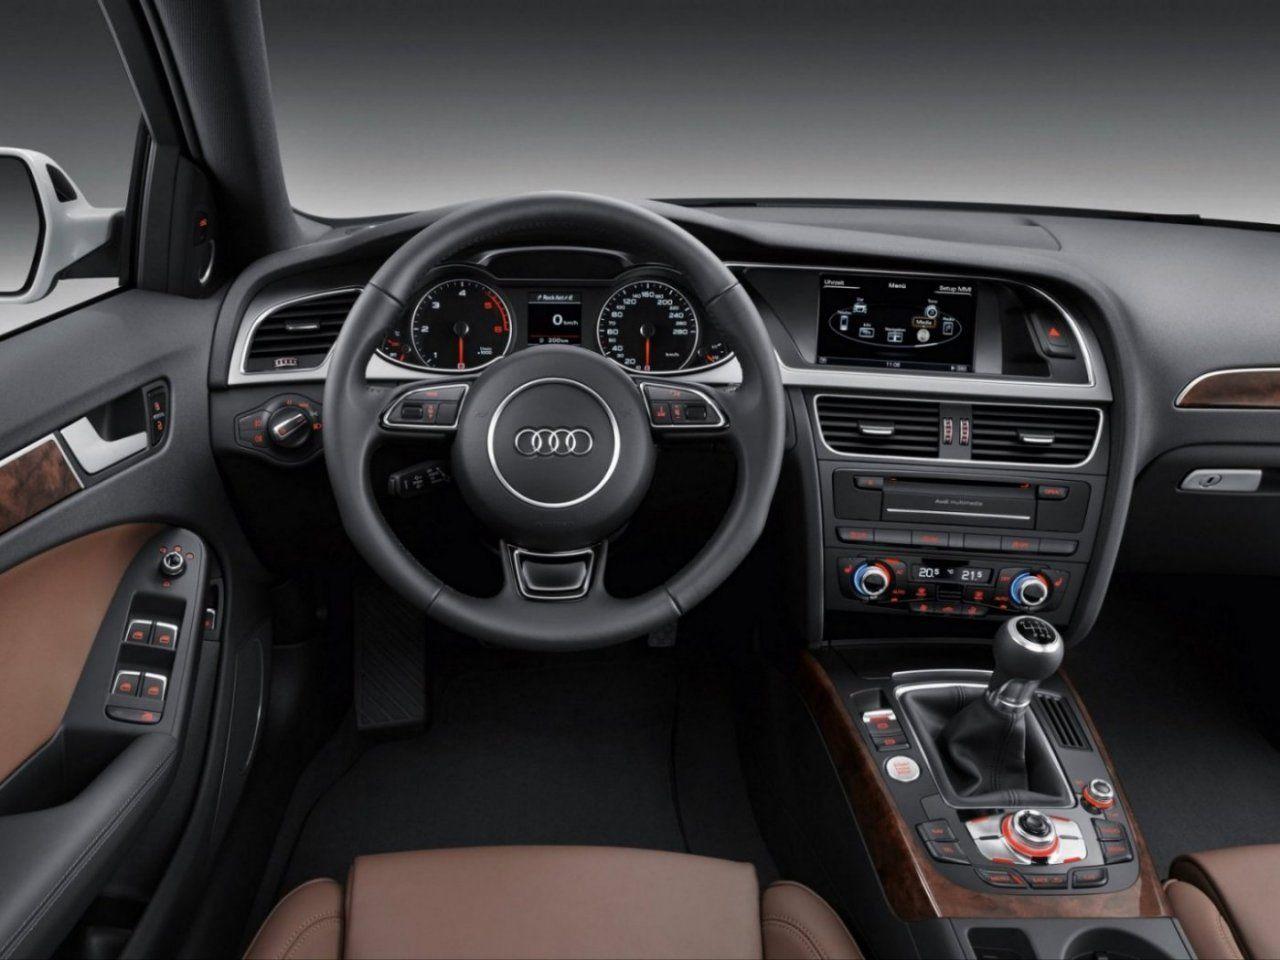 Audi A4 35 Tfsi Black Edition 5dr In 2020 Audi Audi A3 Black Audi